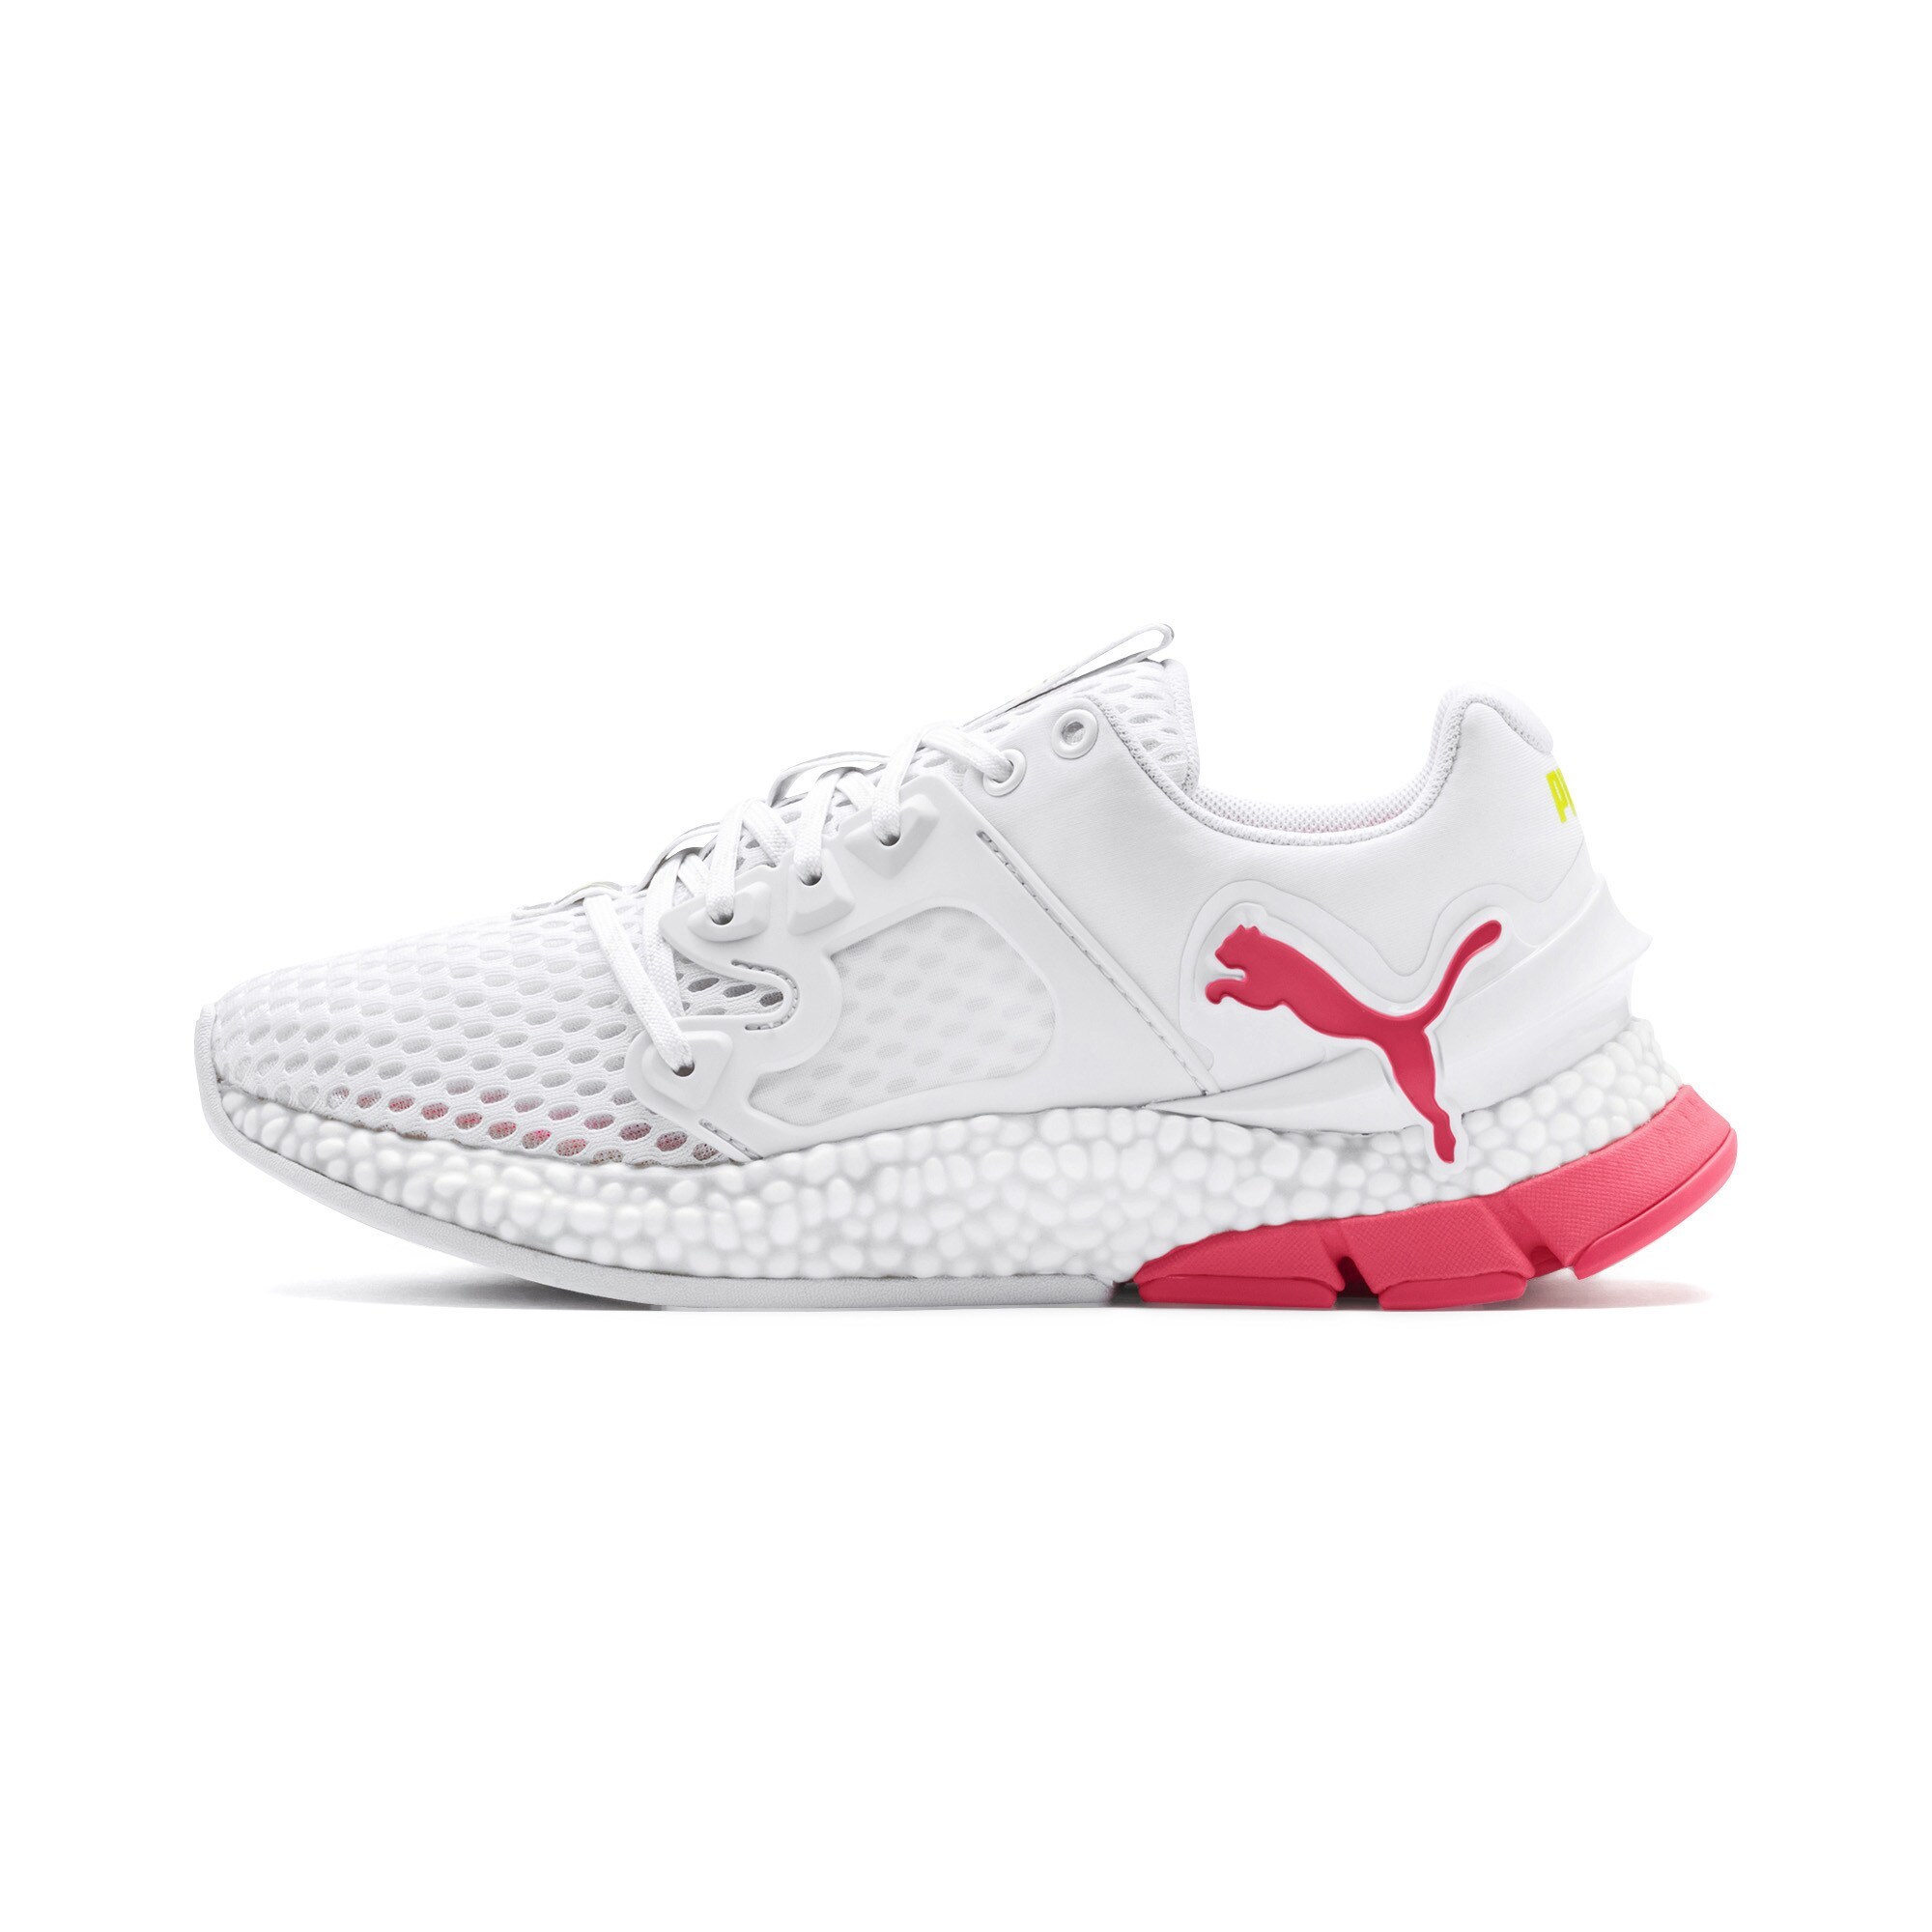 Běžecká obuv Sky pink bílá PUMA